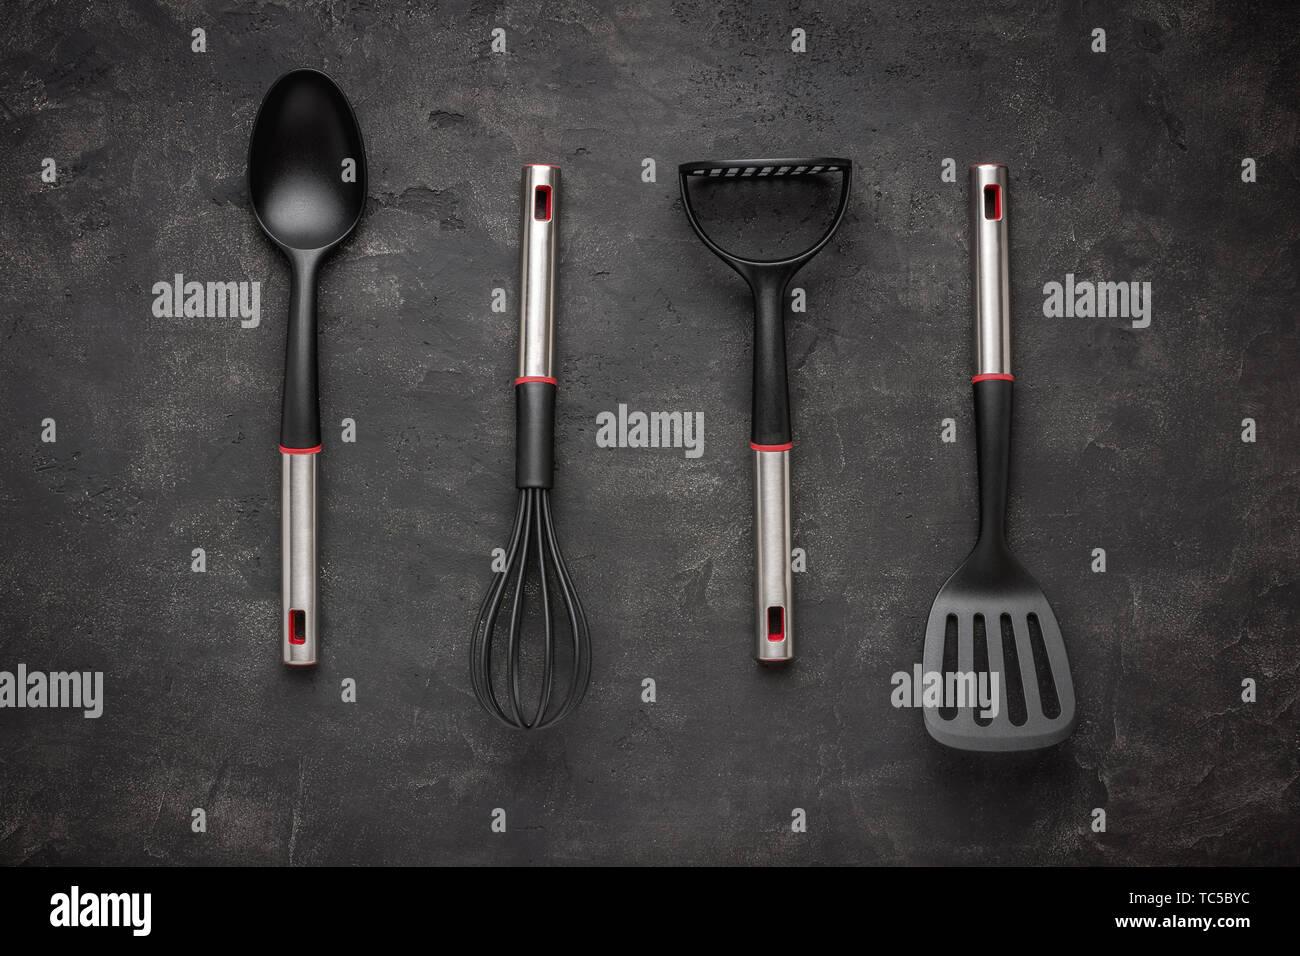 Modern Black Plastic Kitchen Utensils on Dark Background - Stock Image